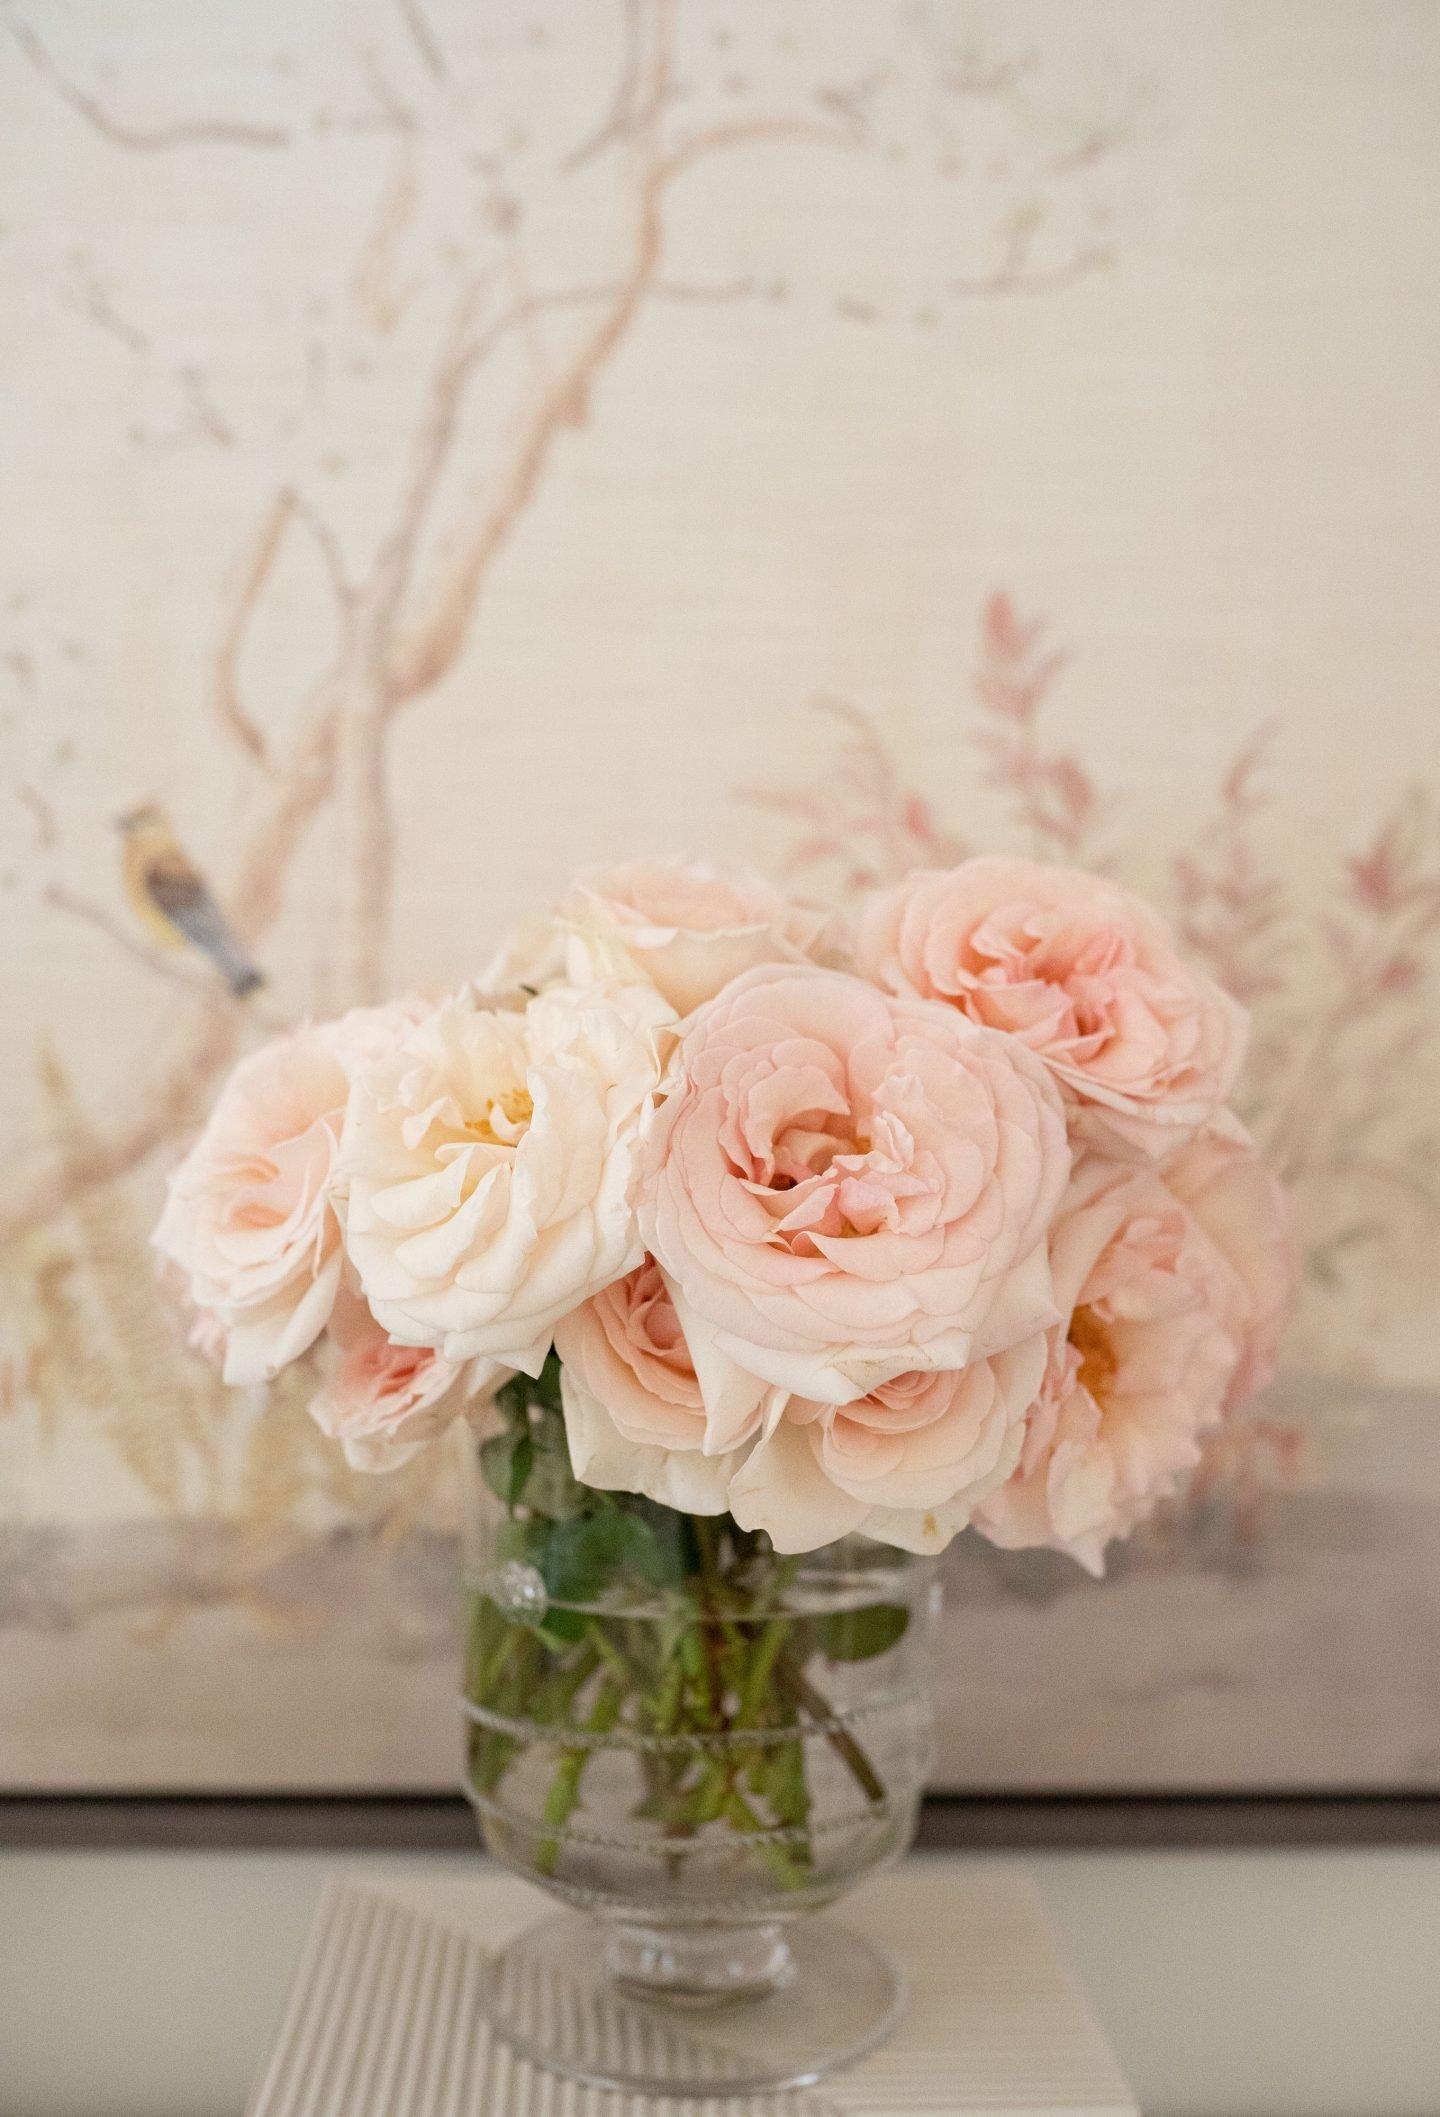 Roses in Juliska Flower Vase by Ashley Brooke | Monday Morning Musings 179